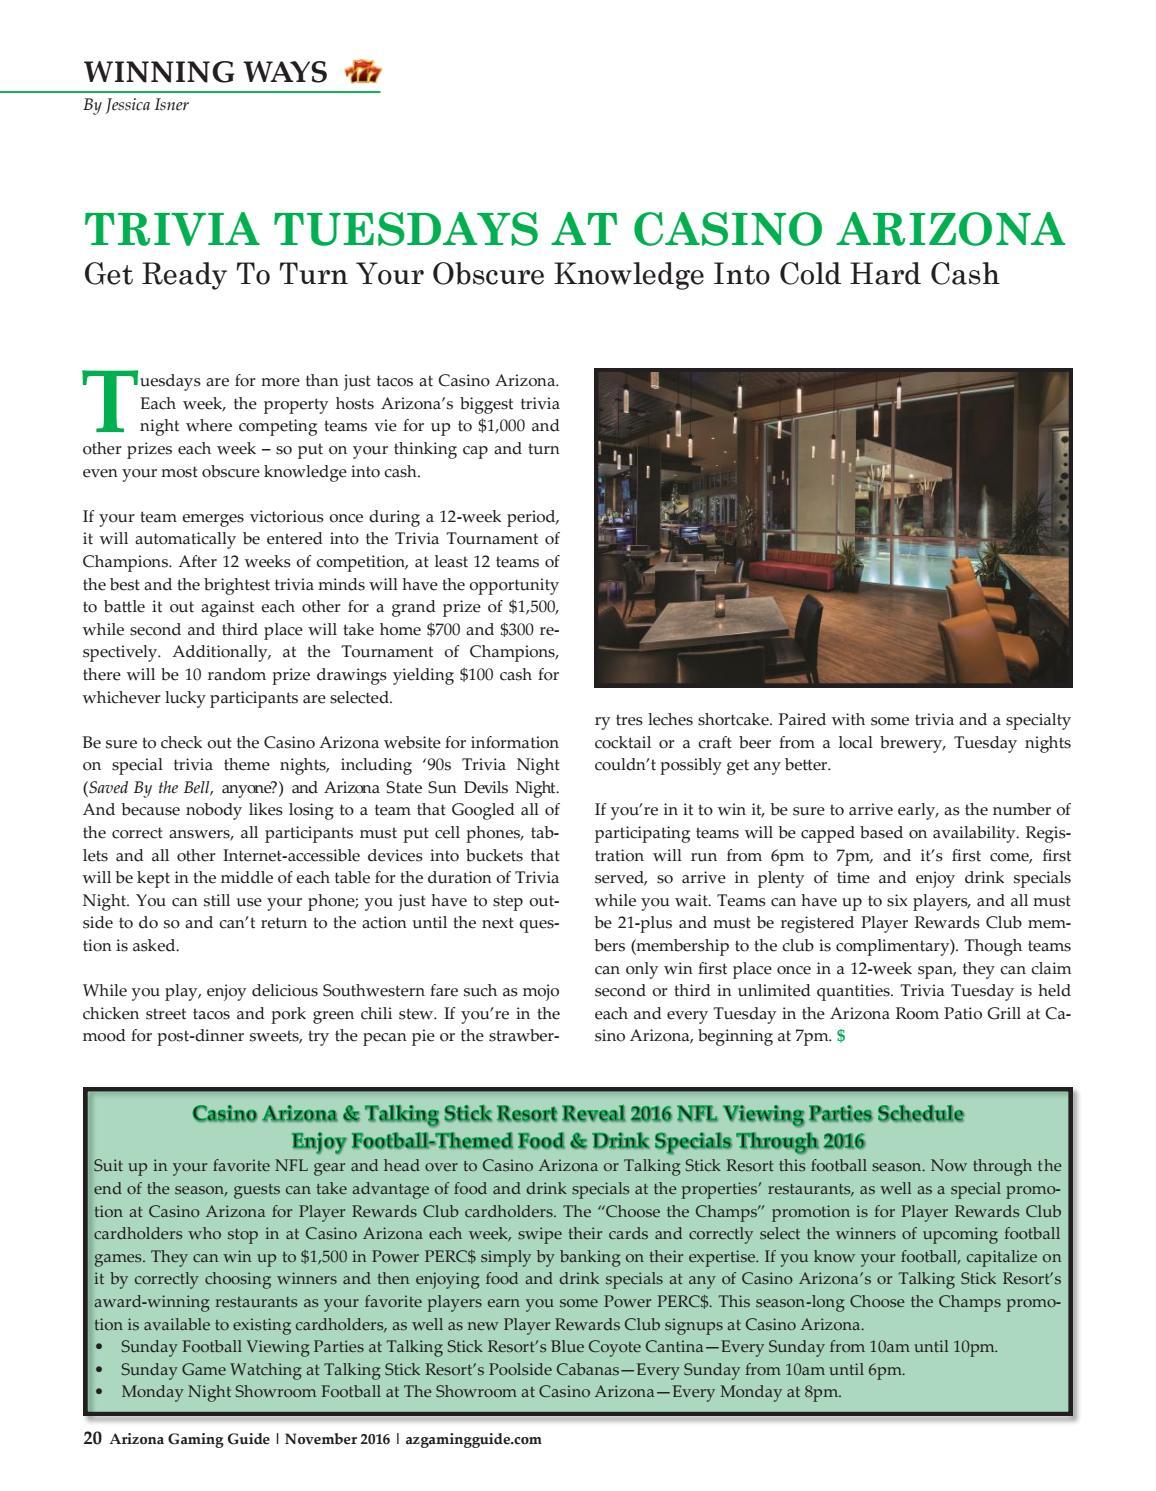 casino arizona trivia